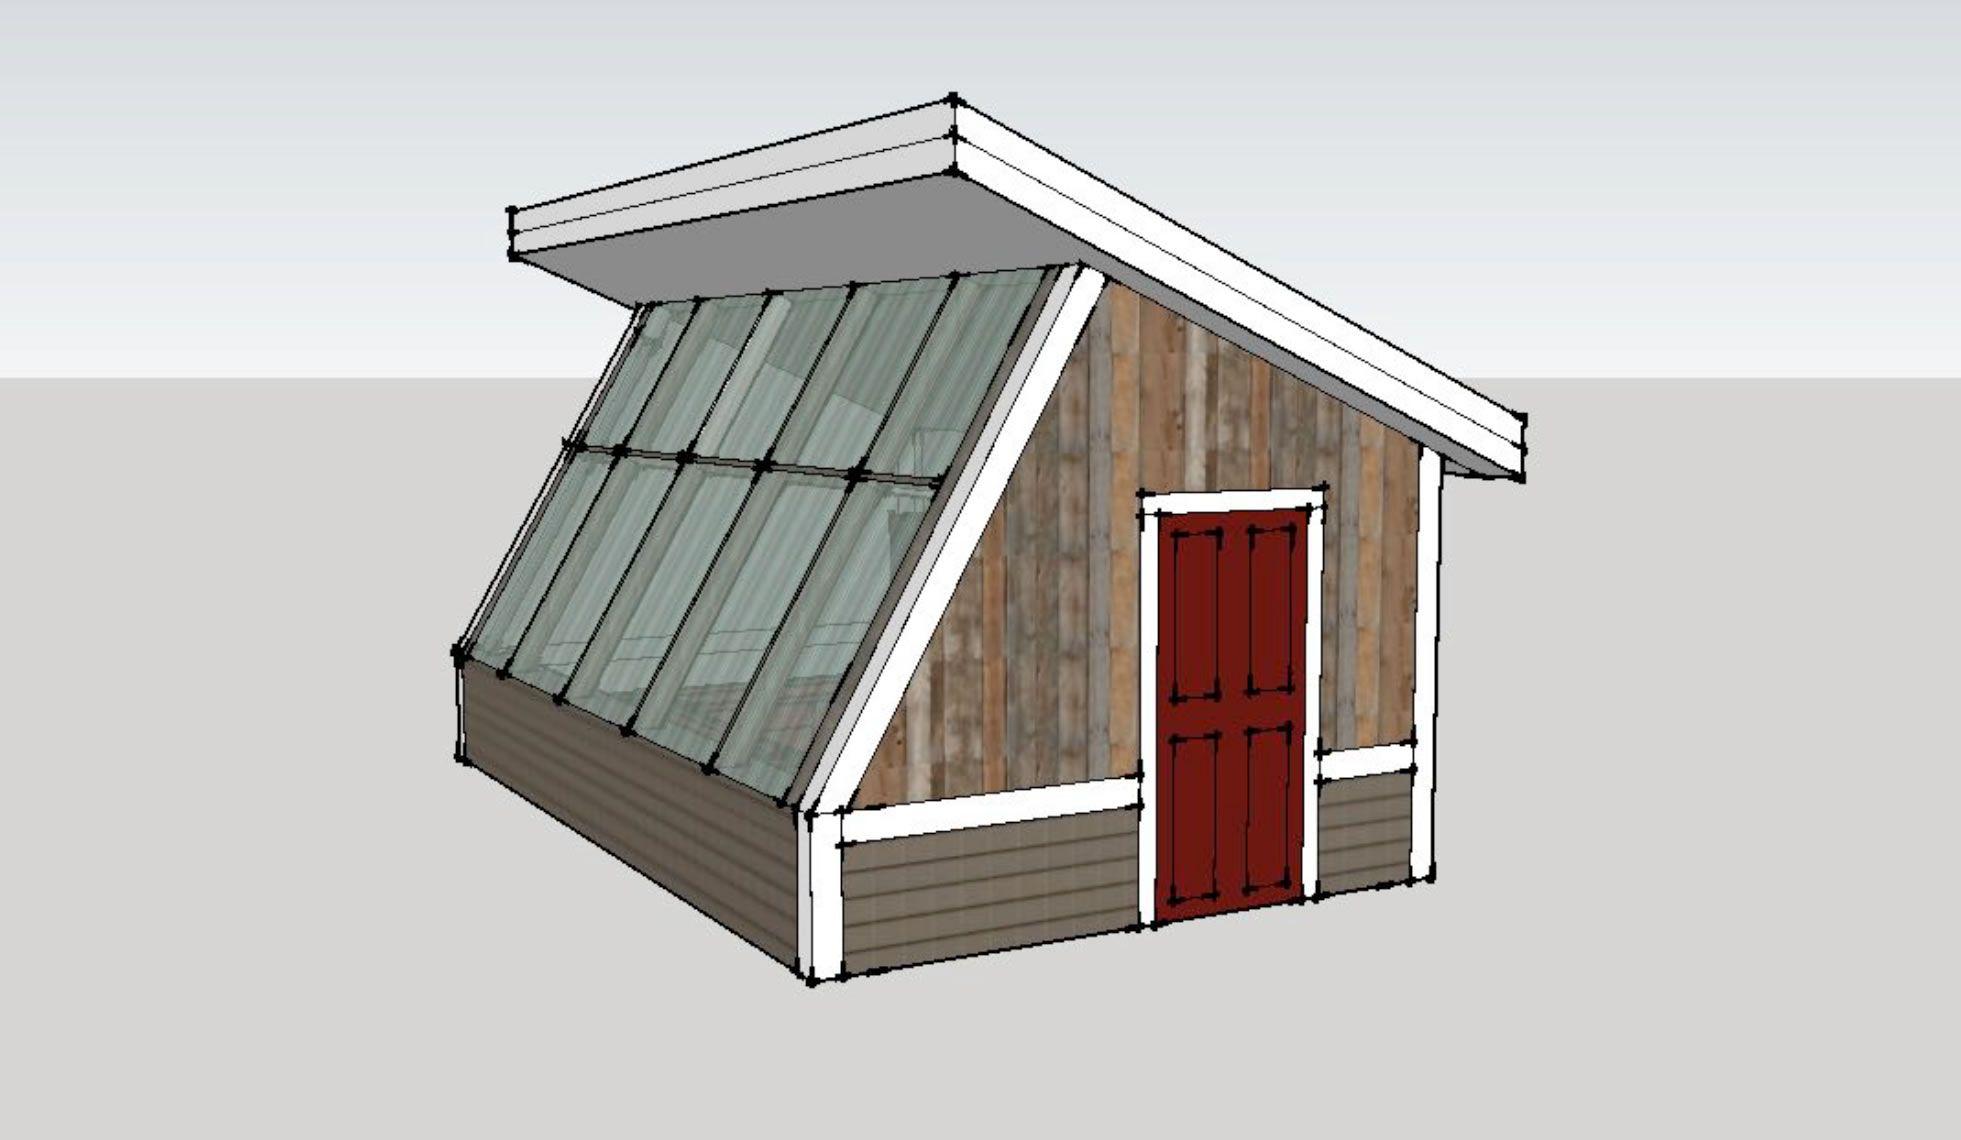 Passive solar greenhouse se perspective rural Passive solar greenhouse design plans